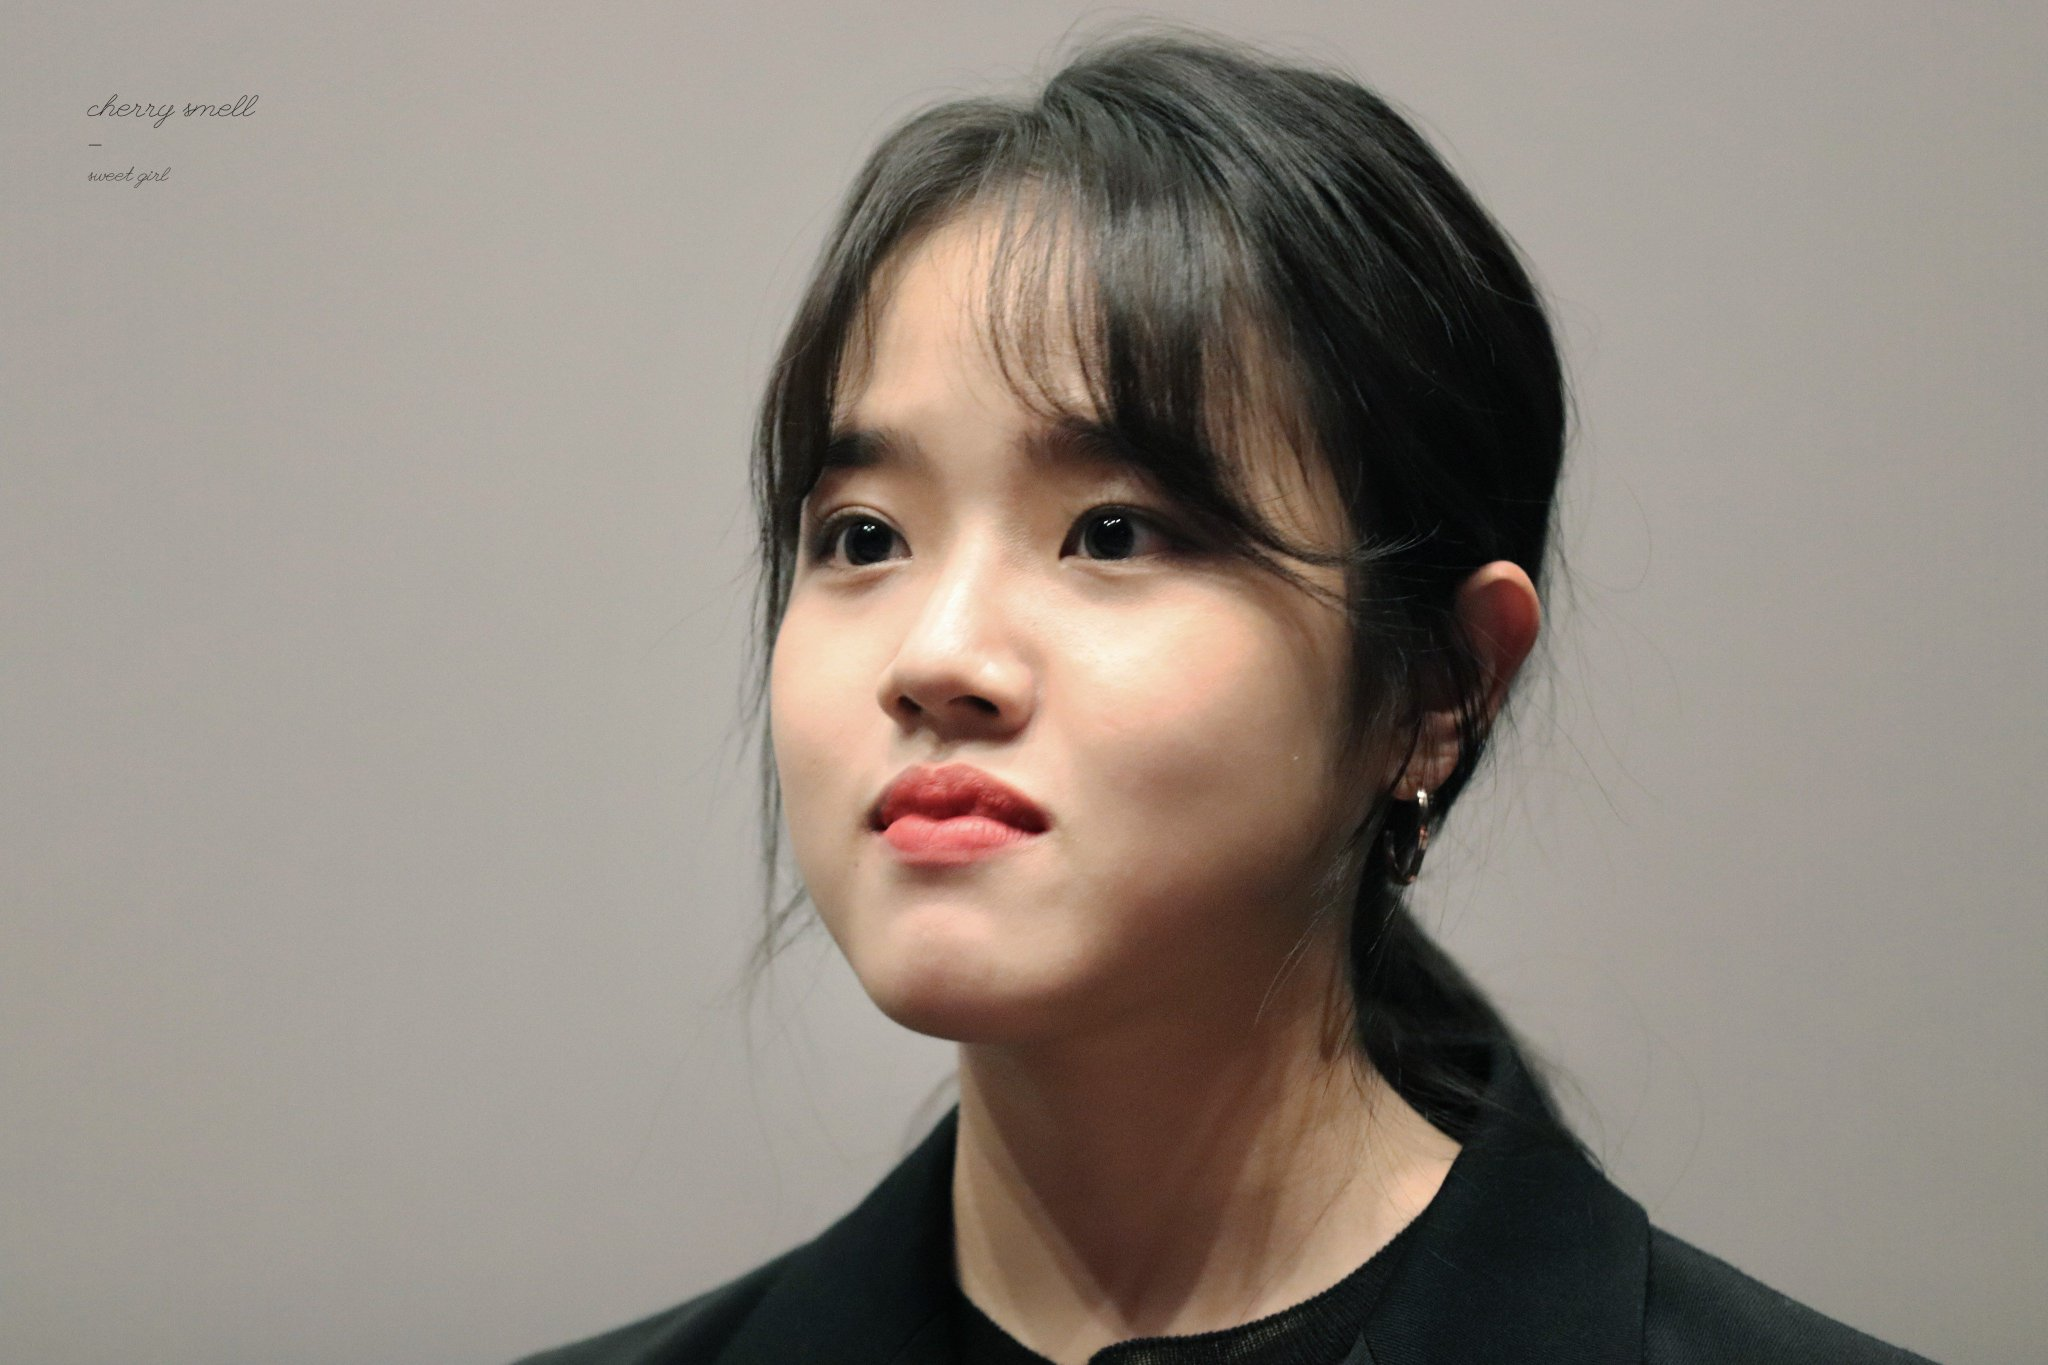 CherrySmell : 체리향기🍒 on Twitter: [181010 부산국제영화제 영주GV